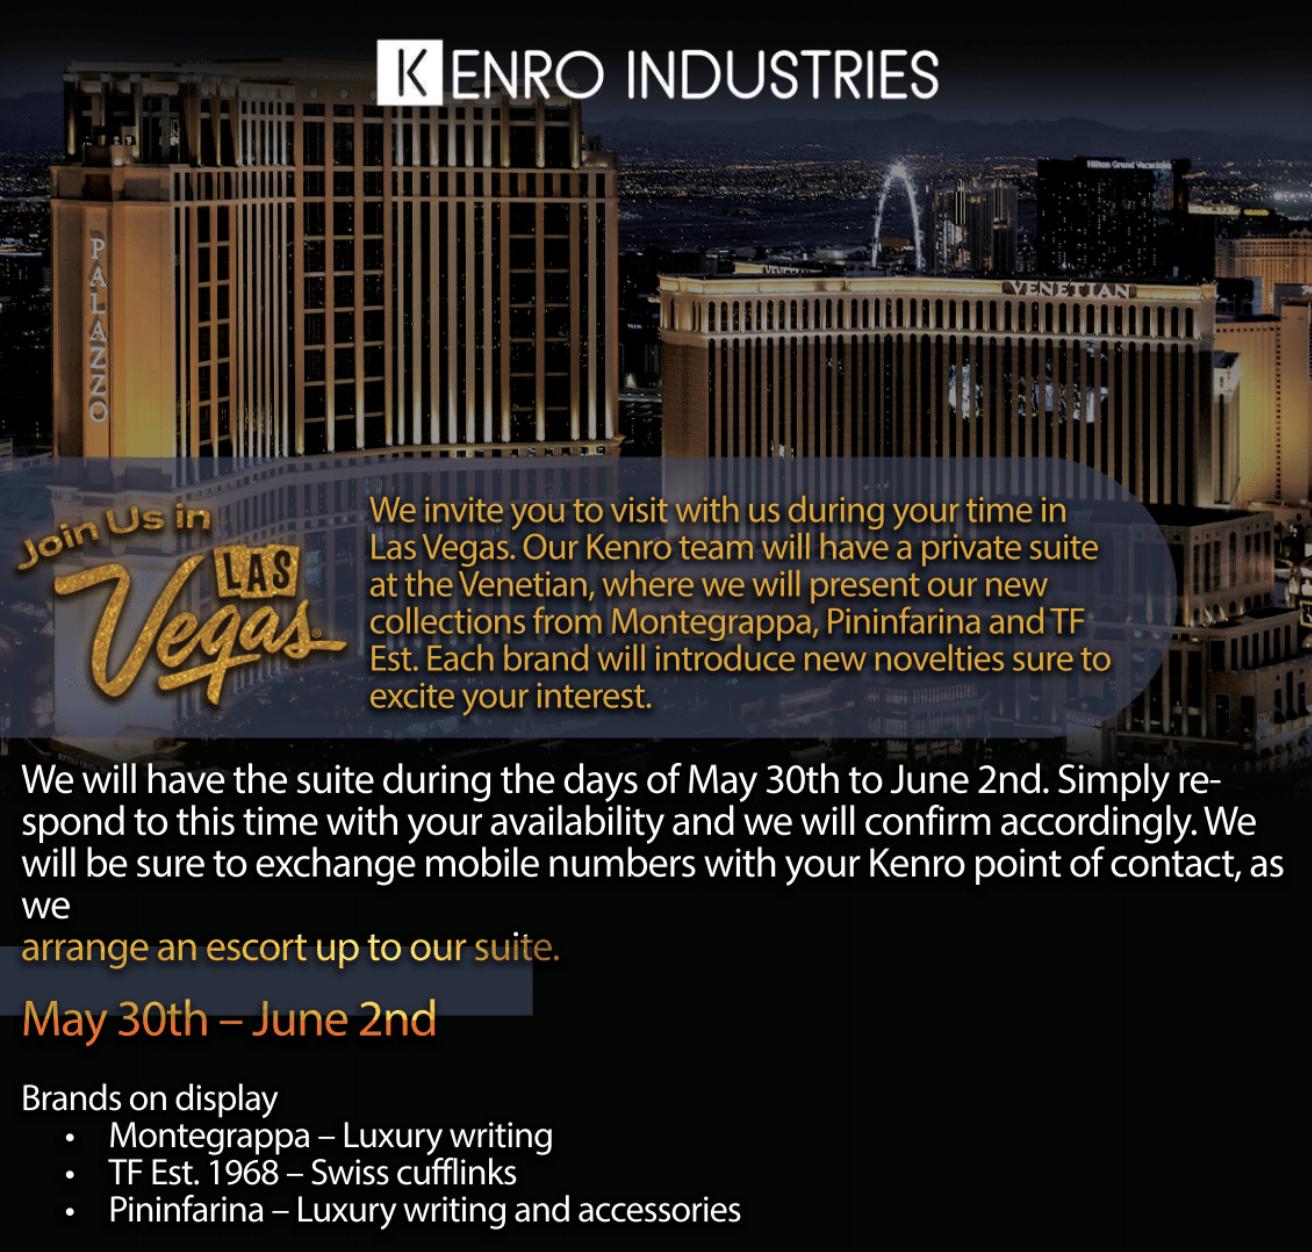 Las Vegas at the Venetian May 30th to June 3rd